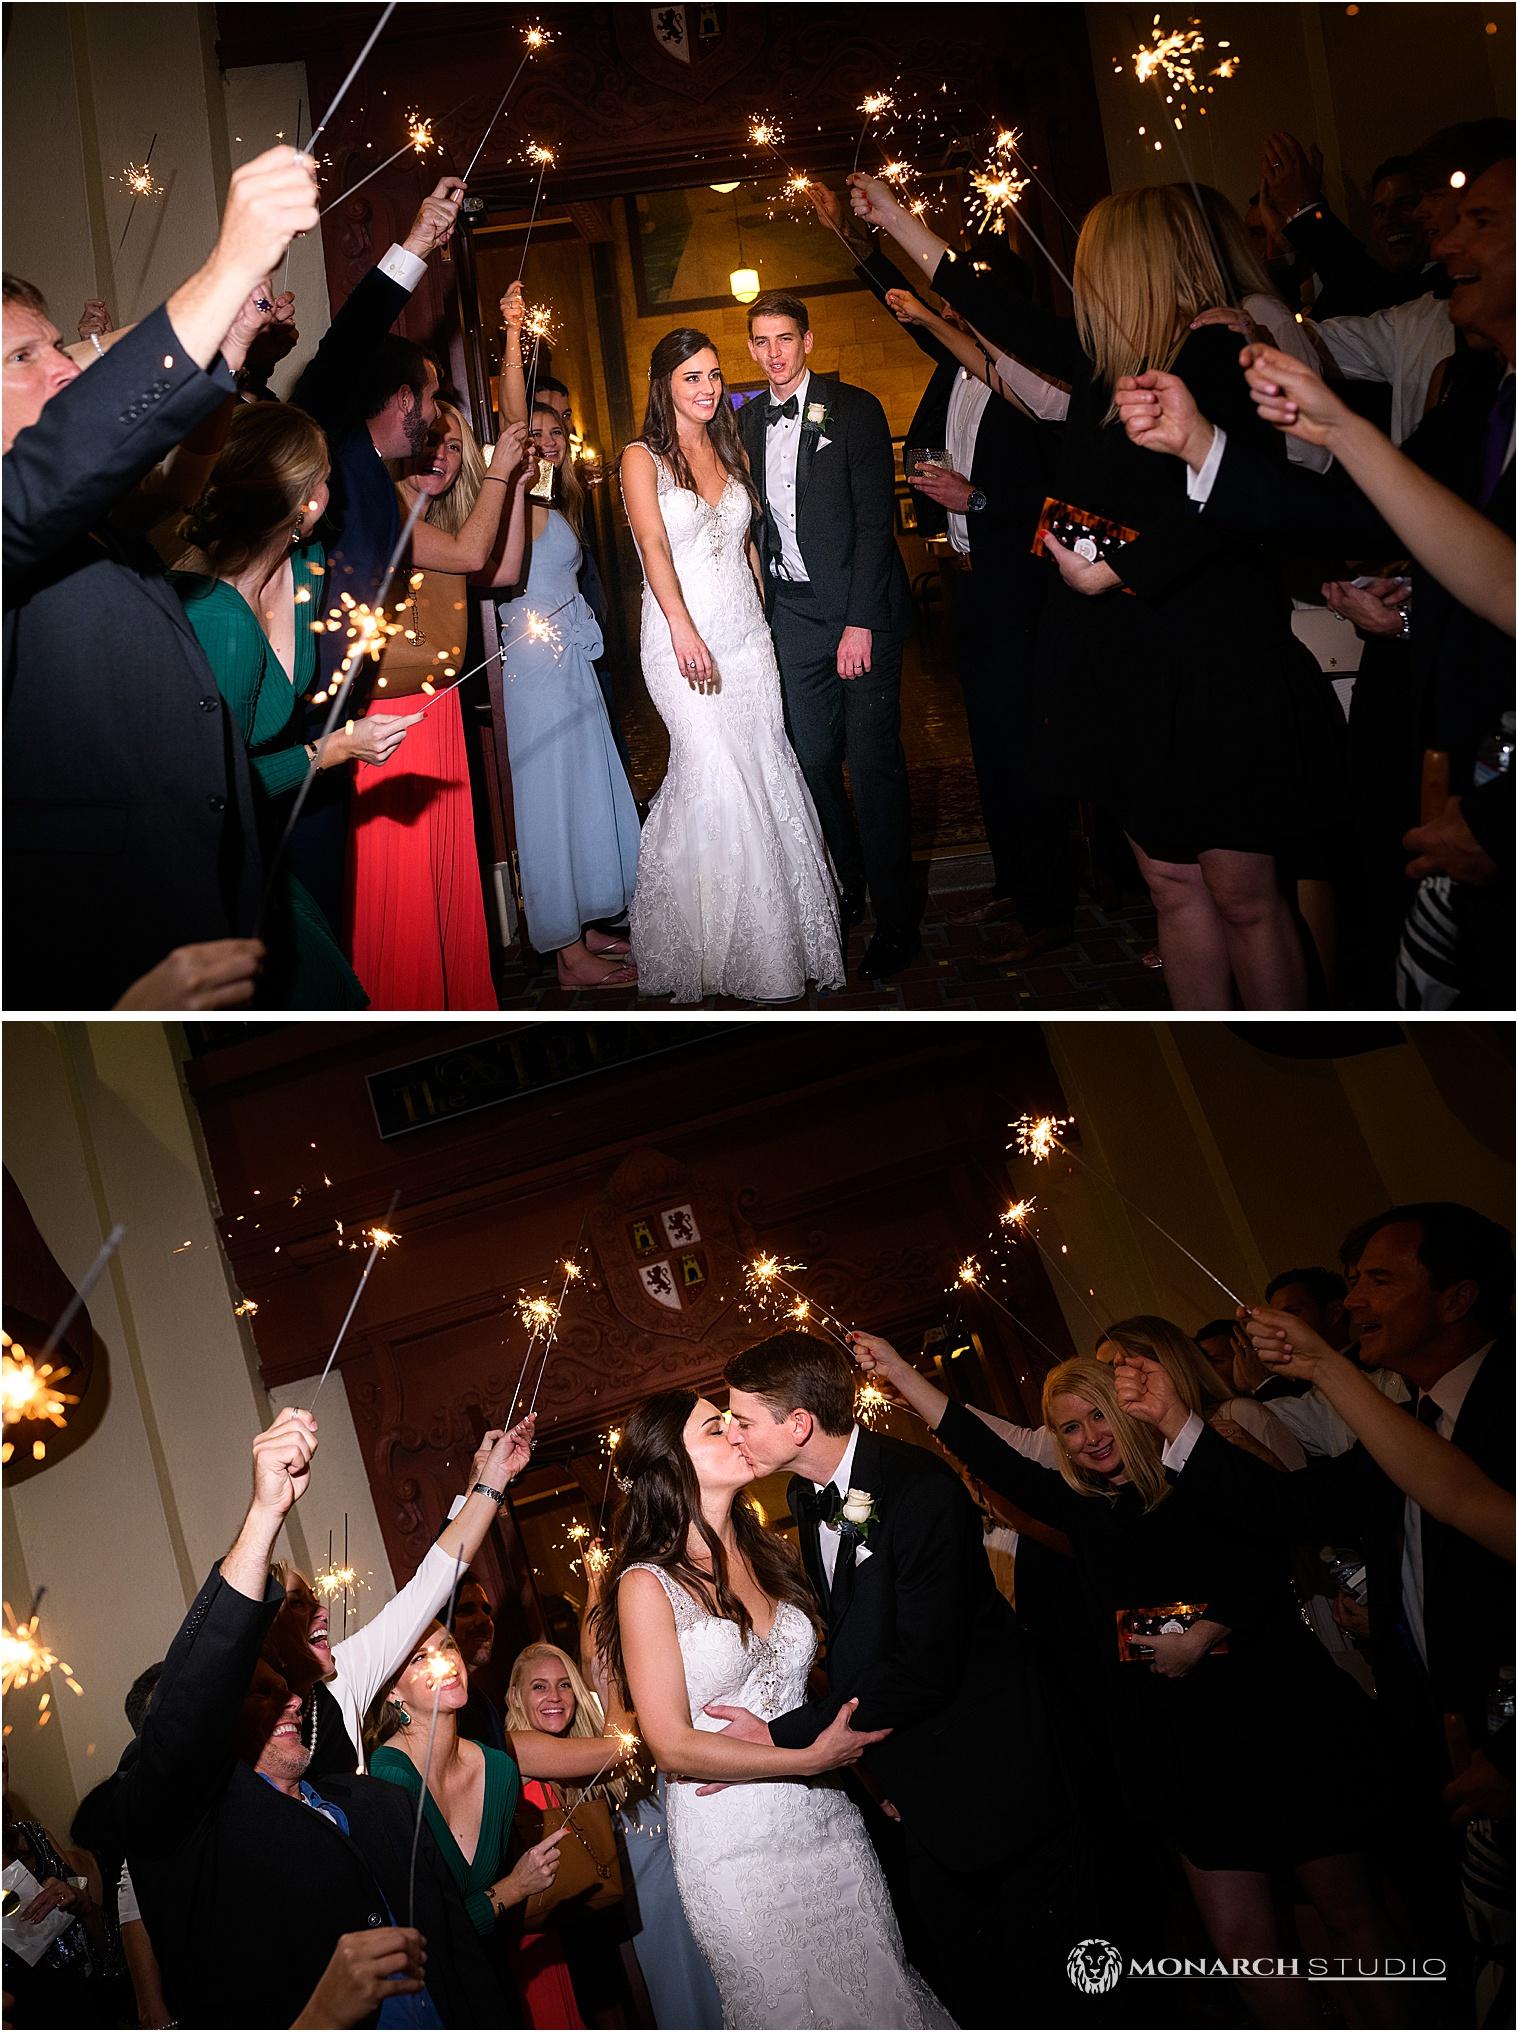 saint-augustine-wedding-photographer-treasury-109.jpg